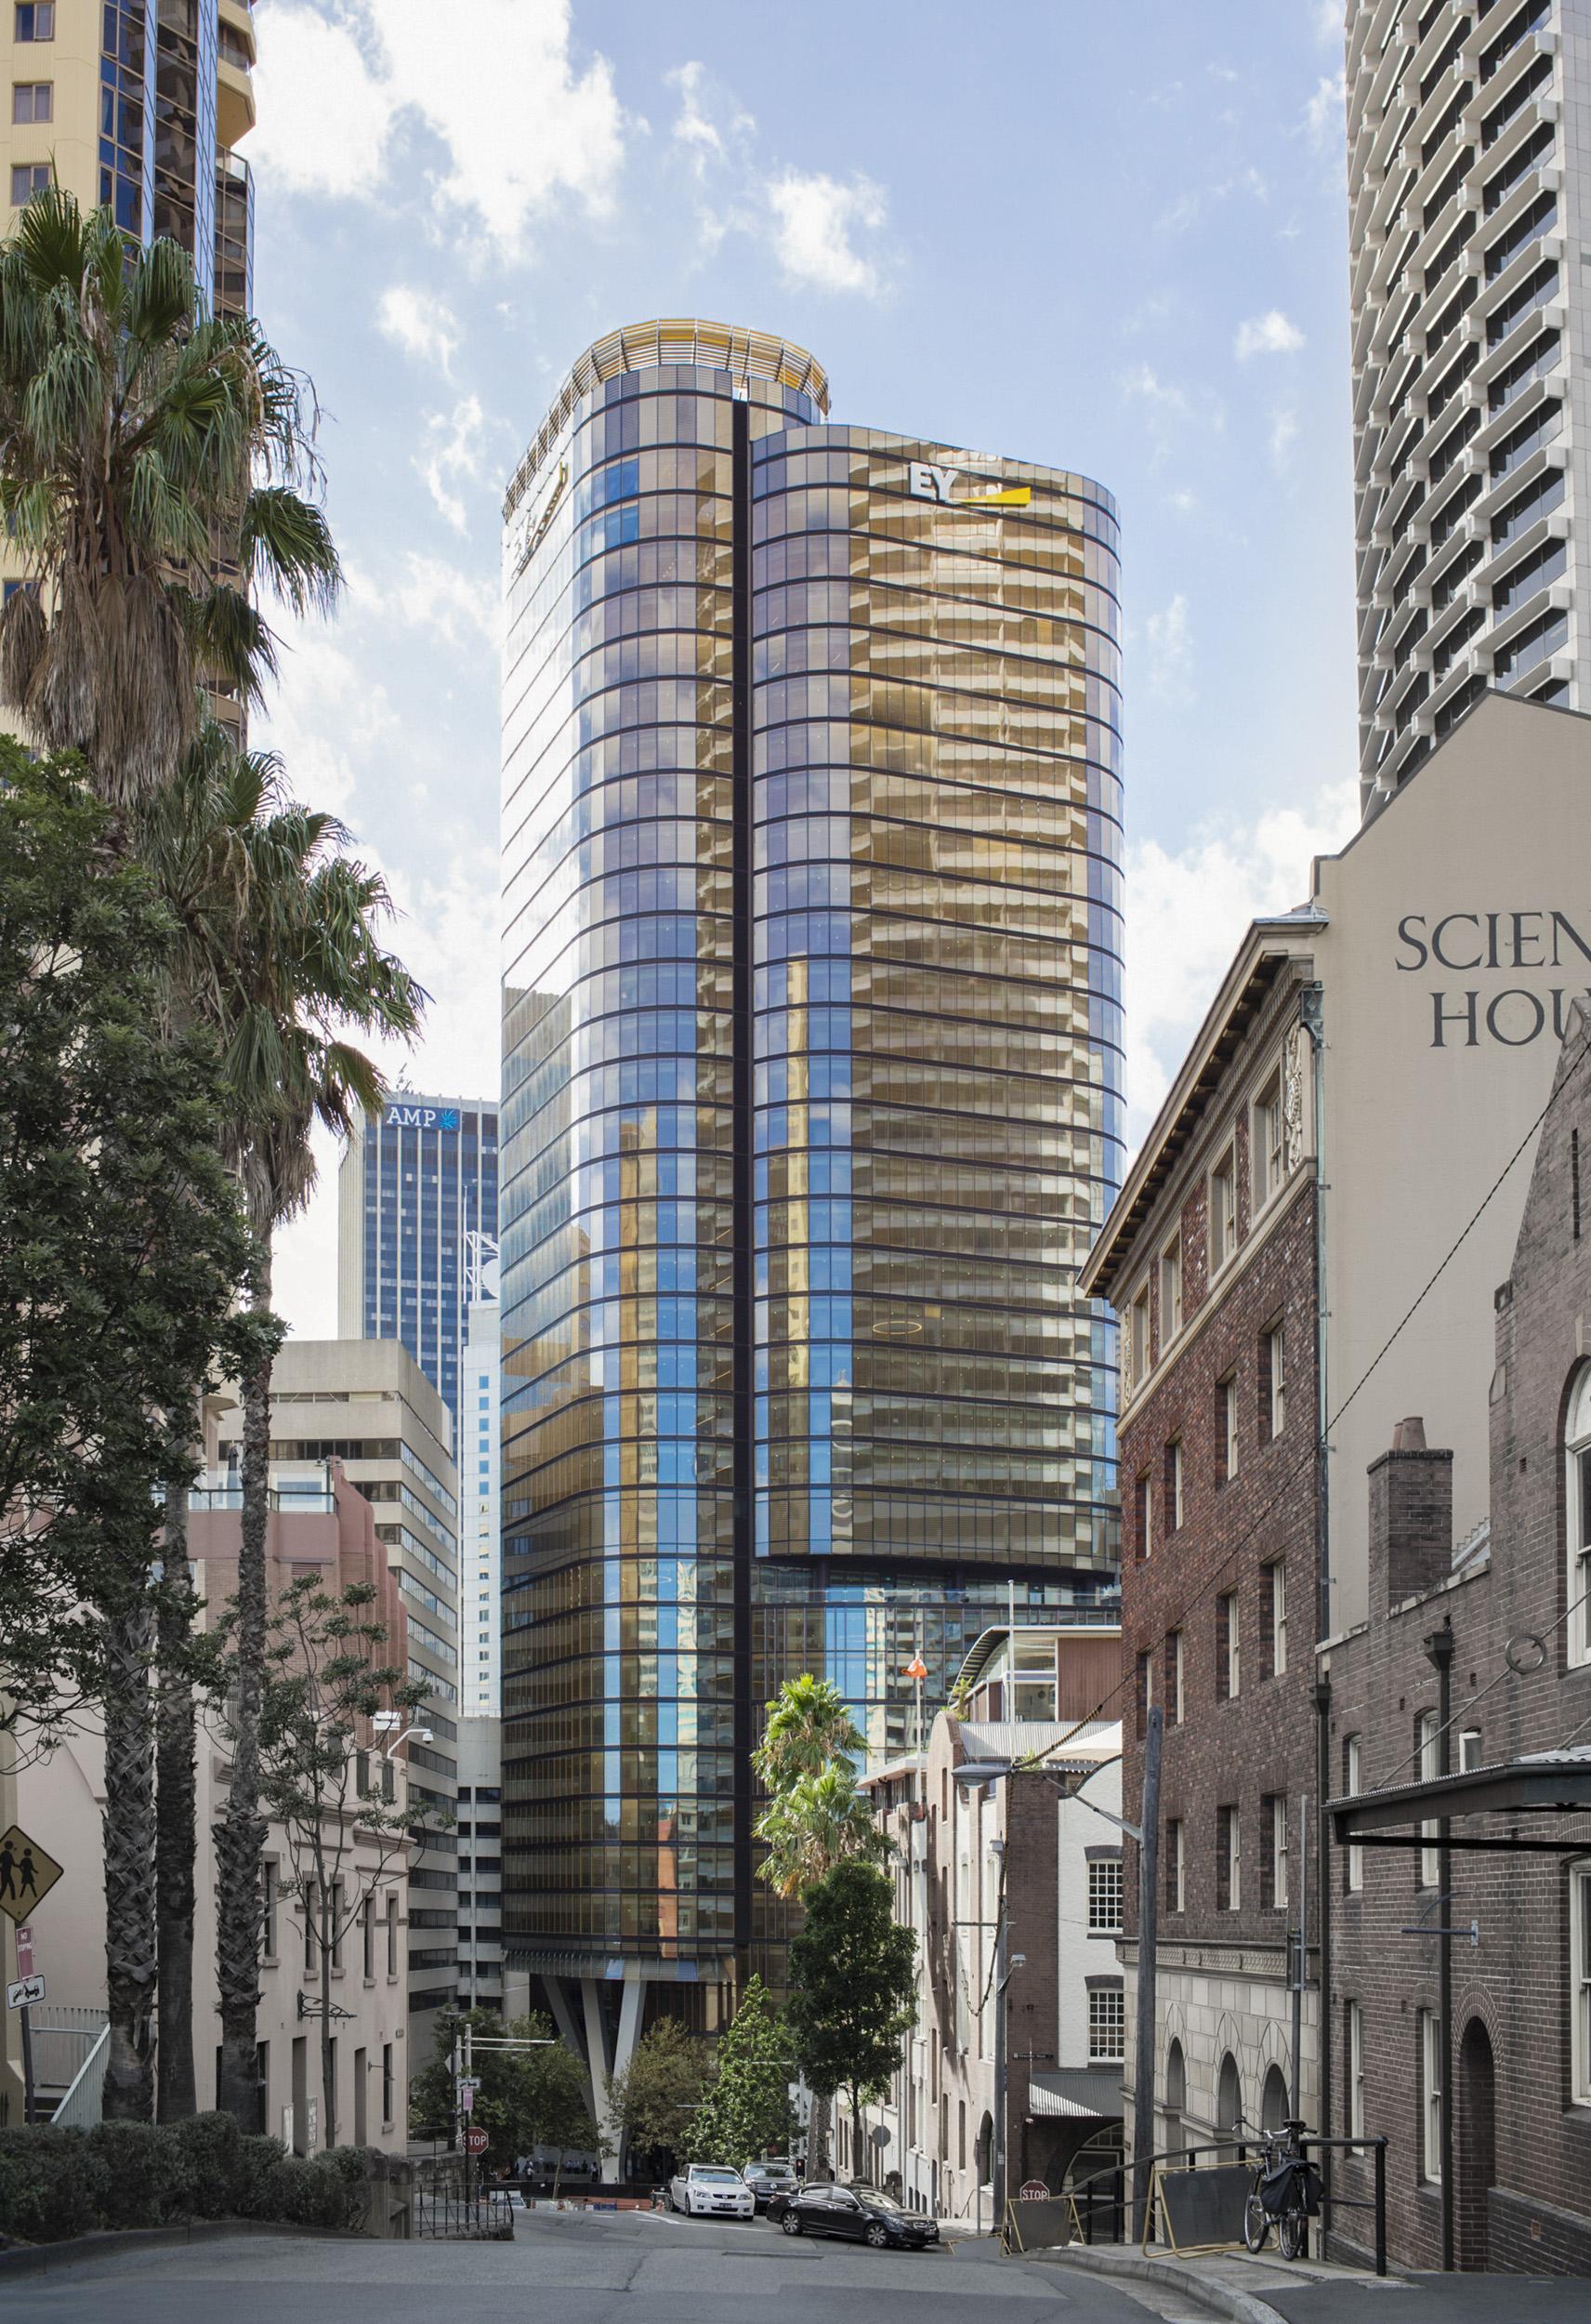 hirise_architecture_sydney_australia_22.jpg